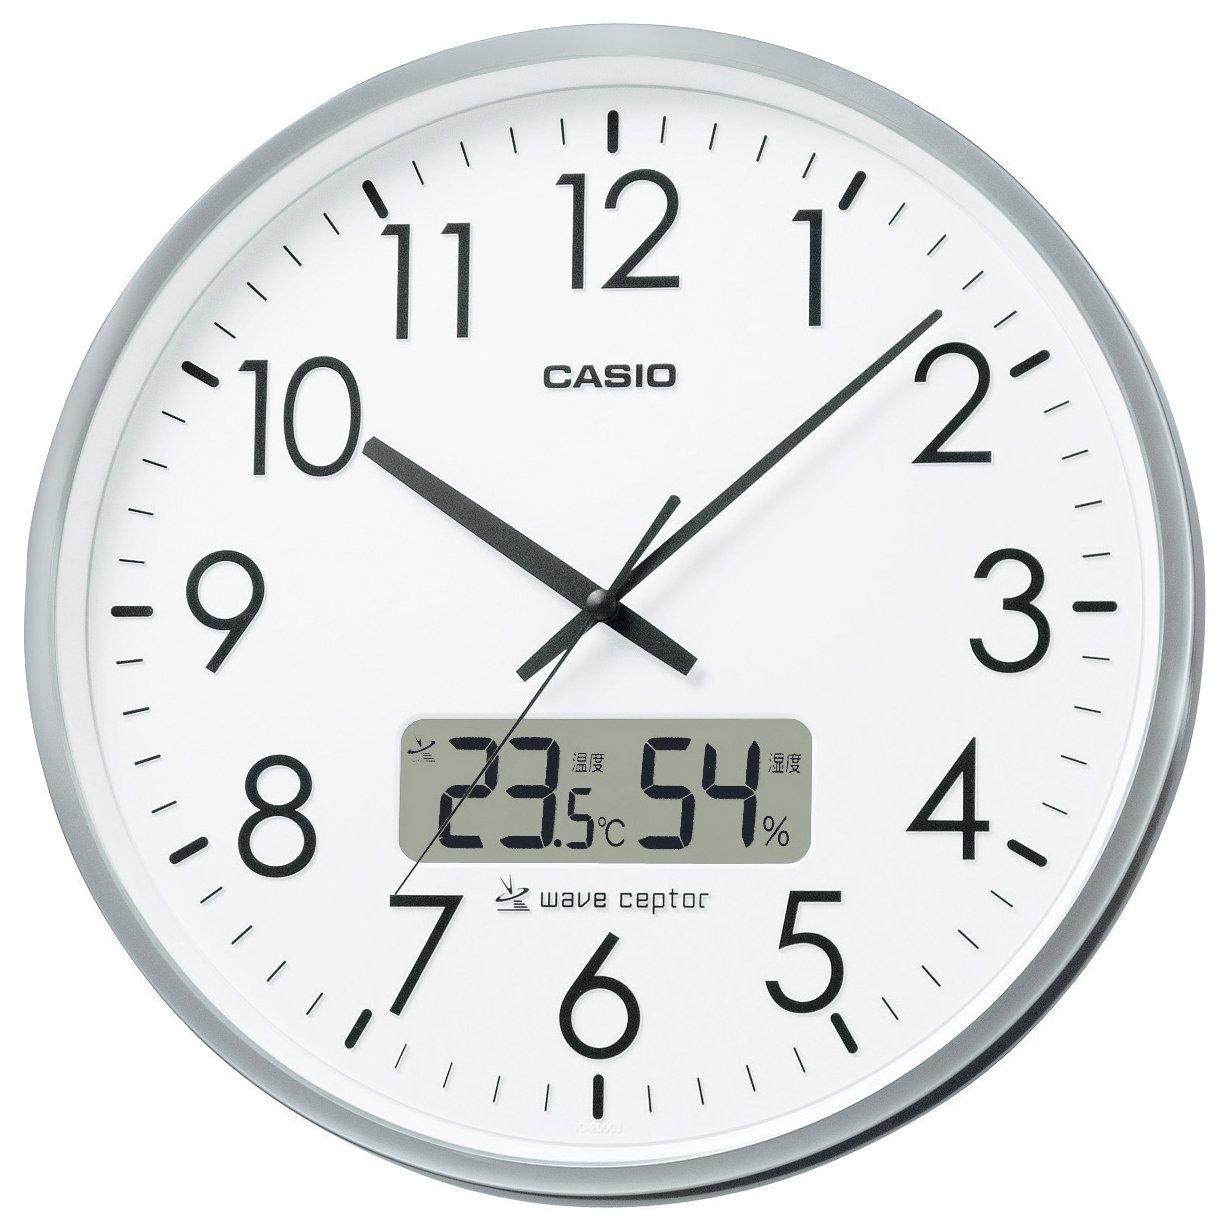 CASIO (カシオ) 電波アナログ掛け時計 温度湿度表示 オフィスタイプ IC-2000J-8JF IC-2000J-8JF B00170KG9C